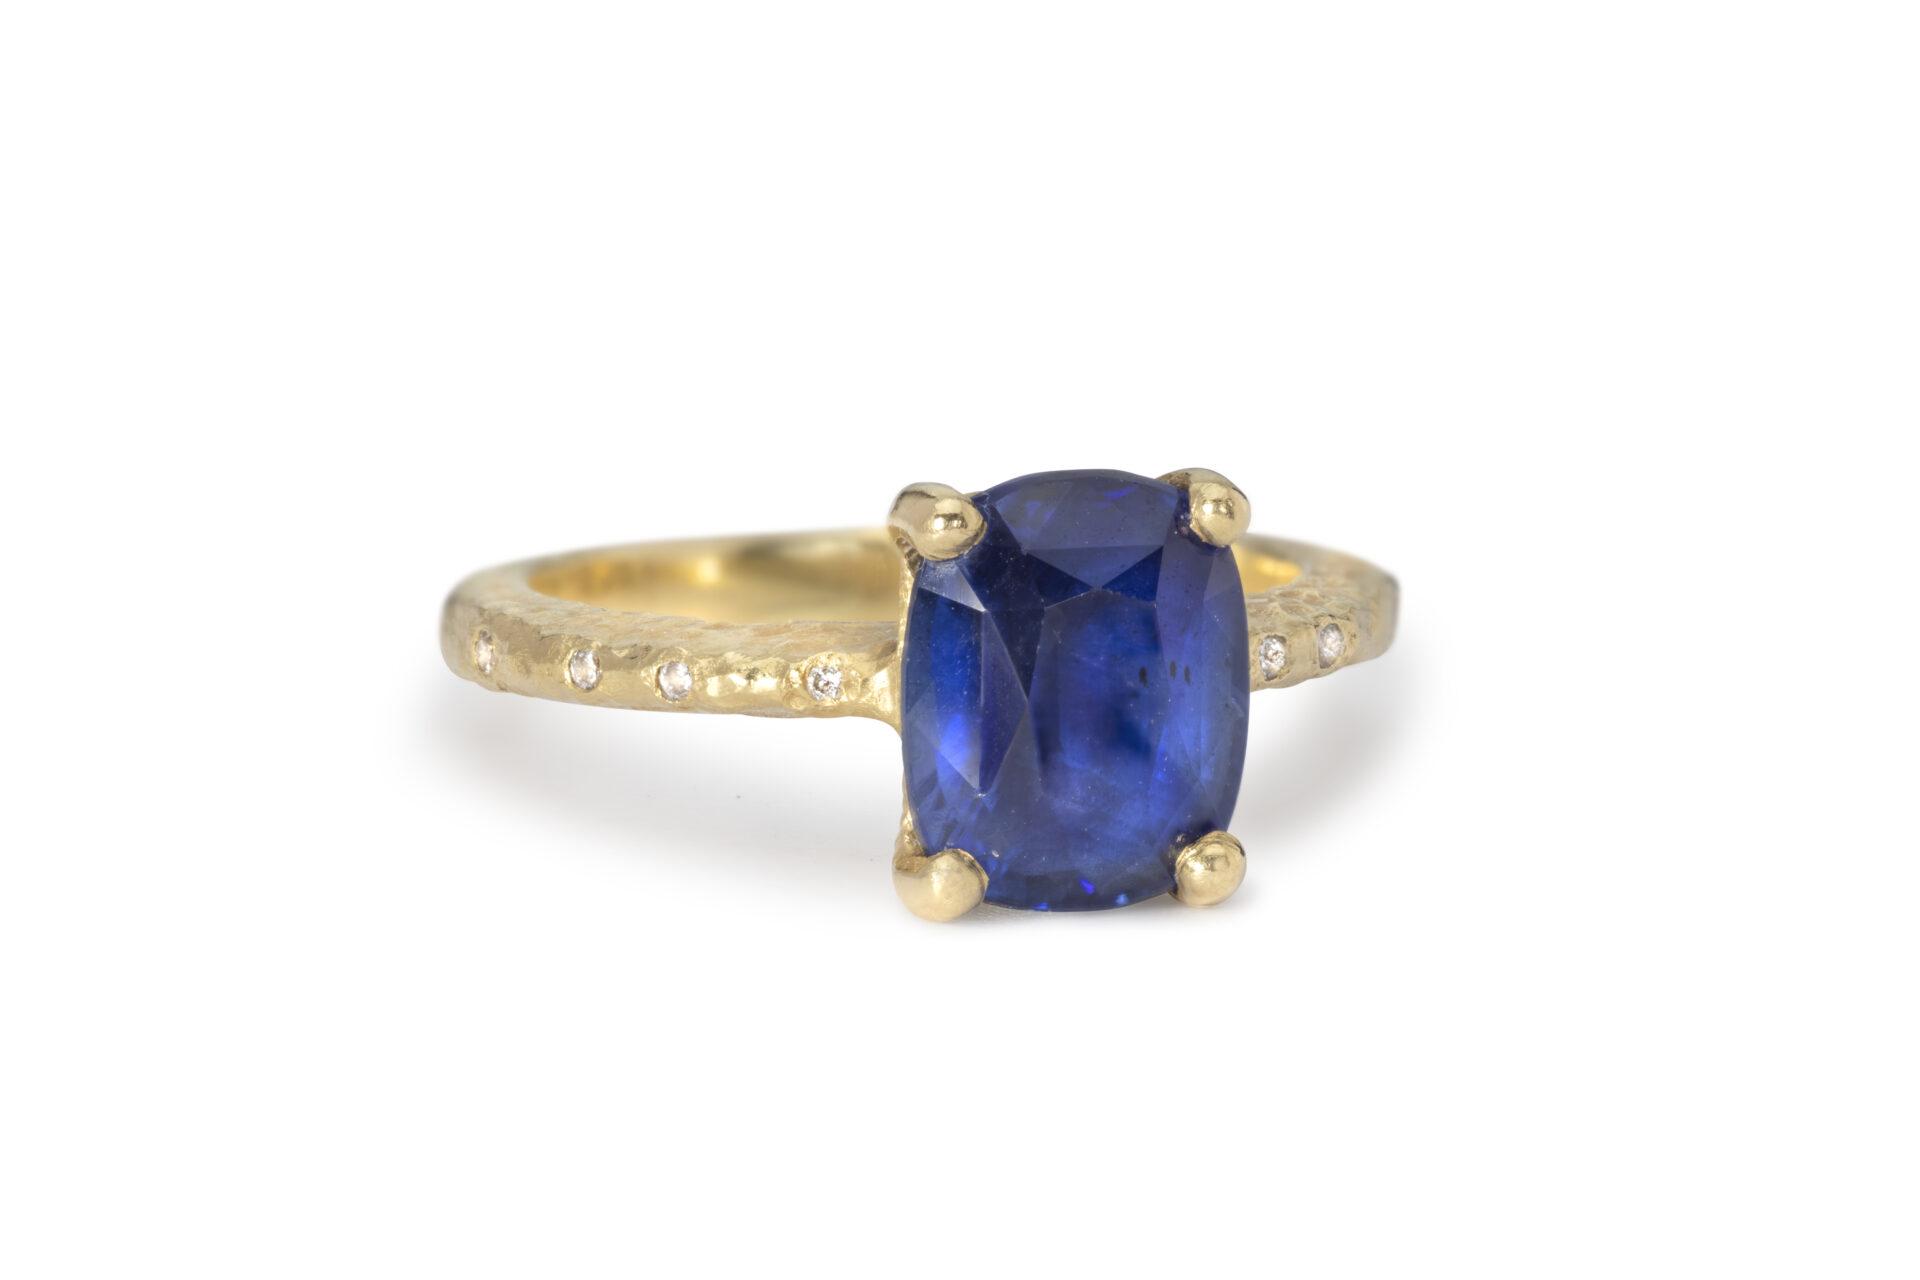 Maya's Cushion Cut Sapphire Ring